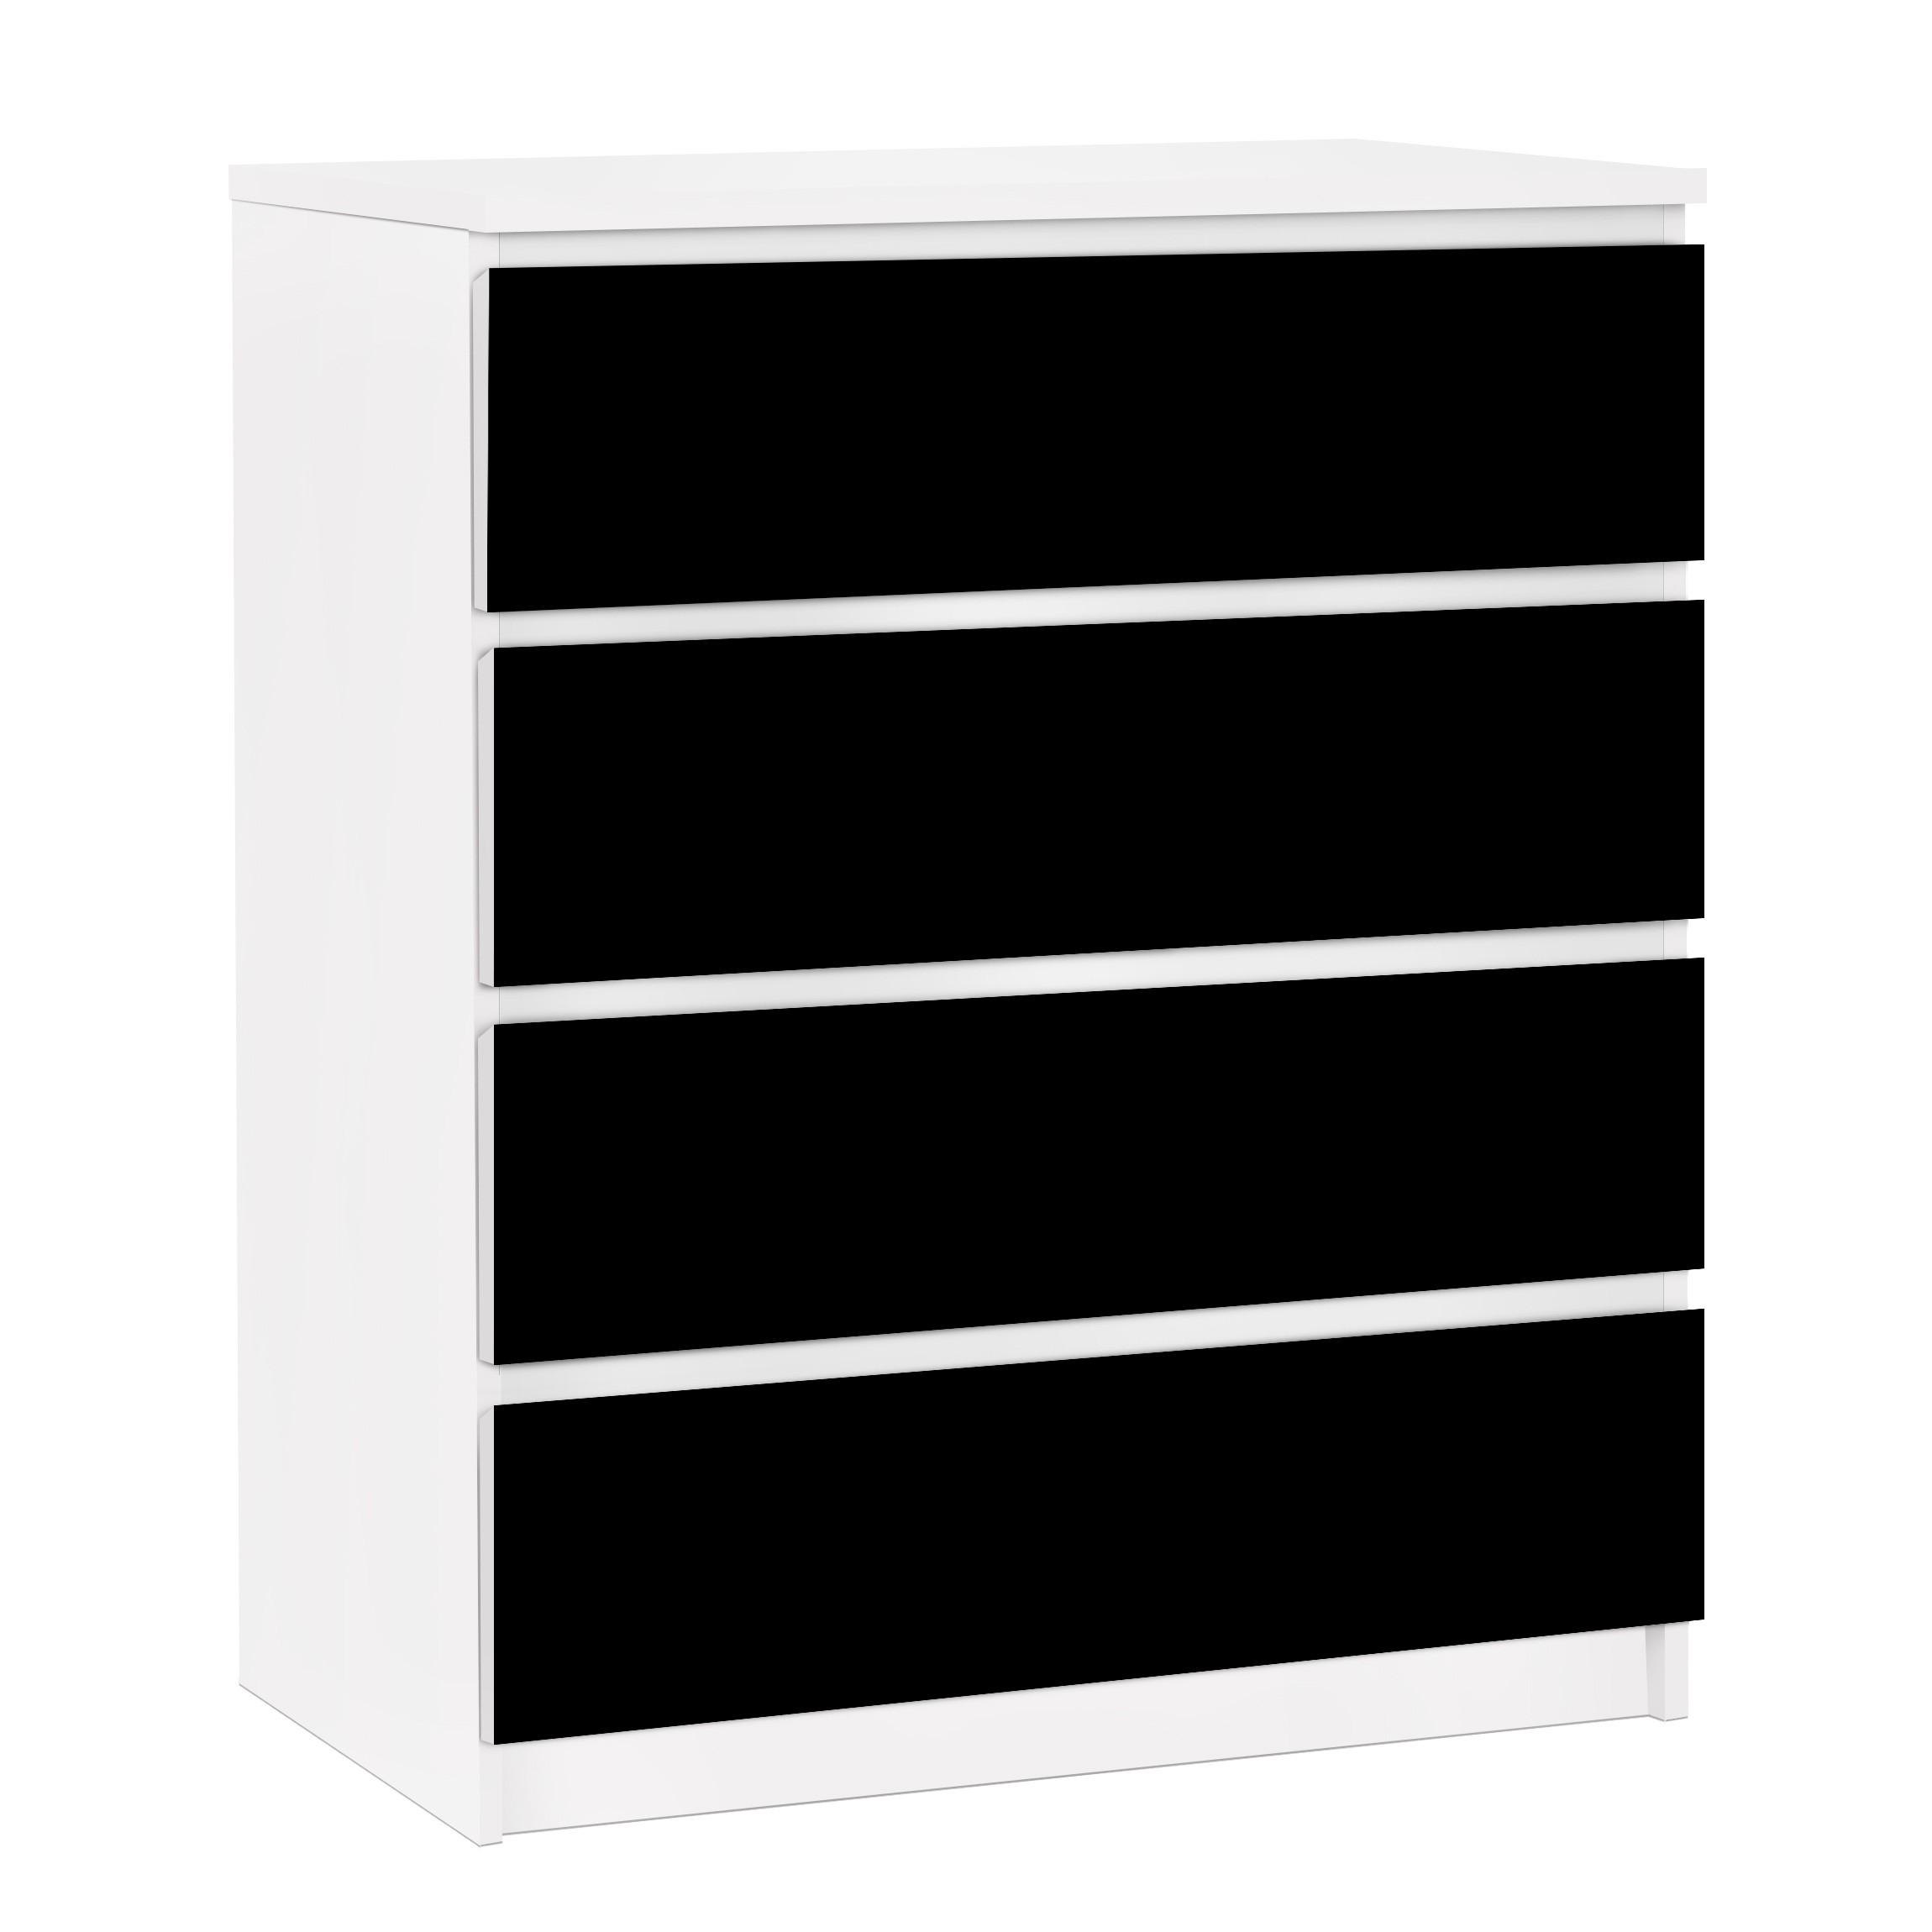 m belfolie f r ikea malm kommode selbstklebende folie colour black. Black Bedroom Furniture Sets. Home Design Ideas